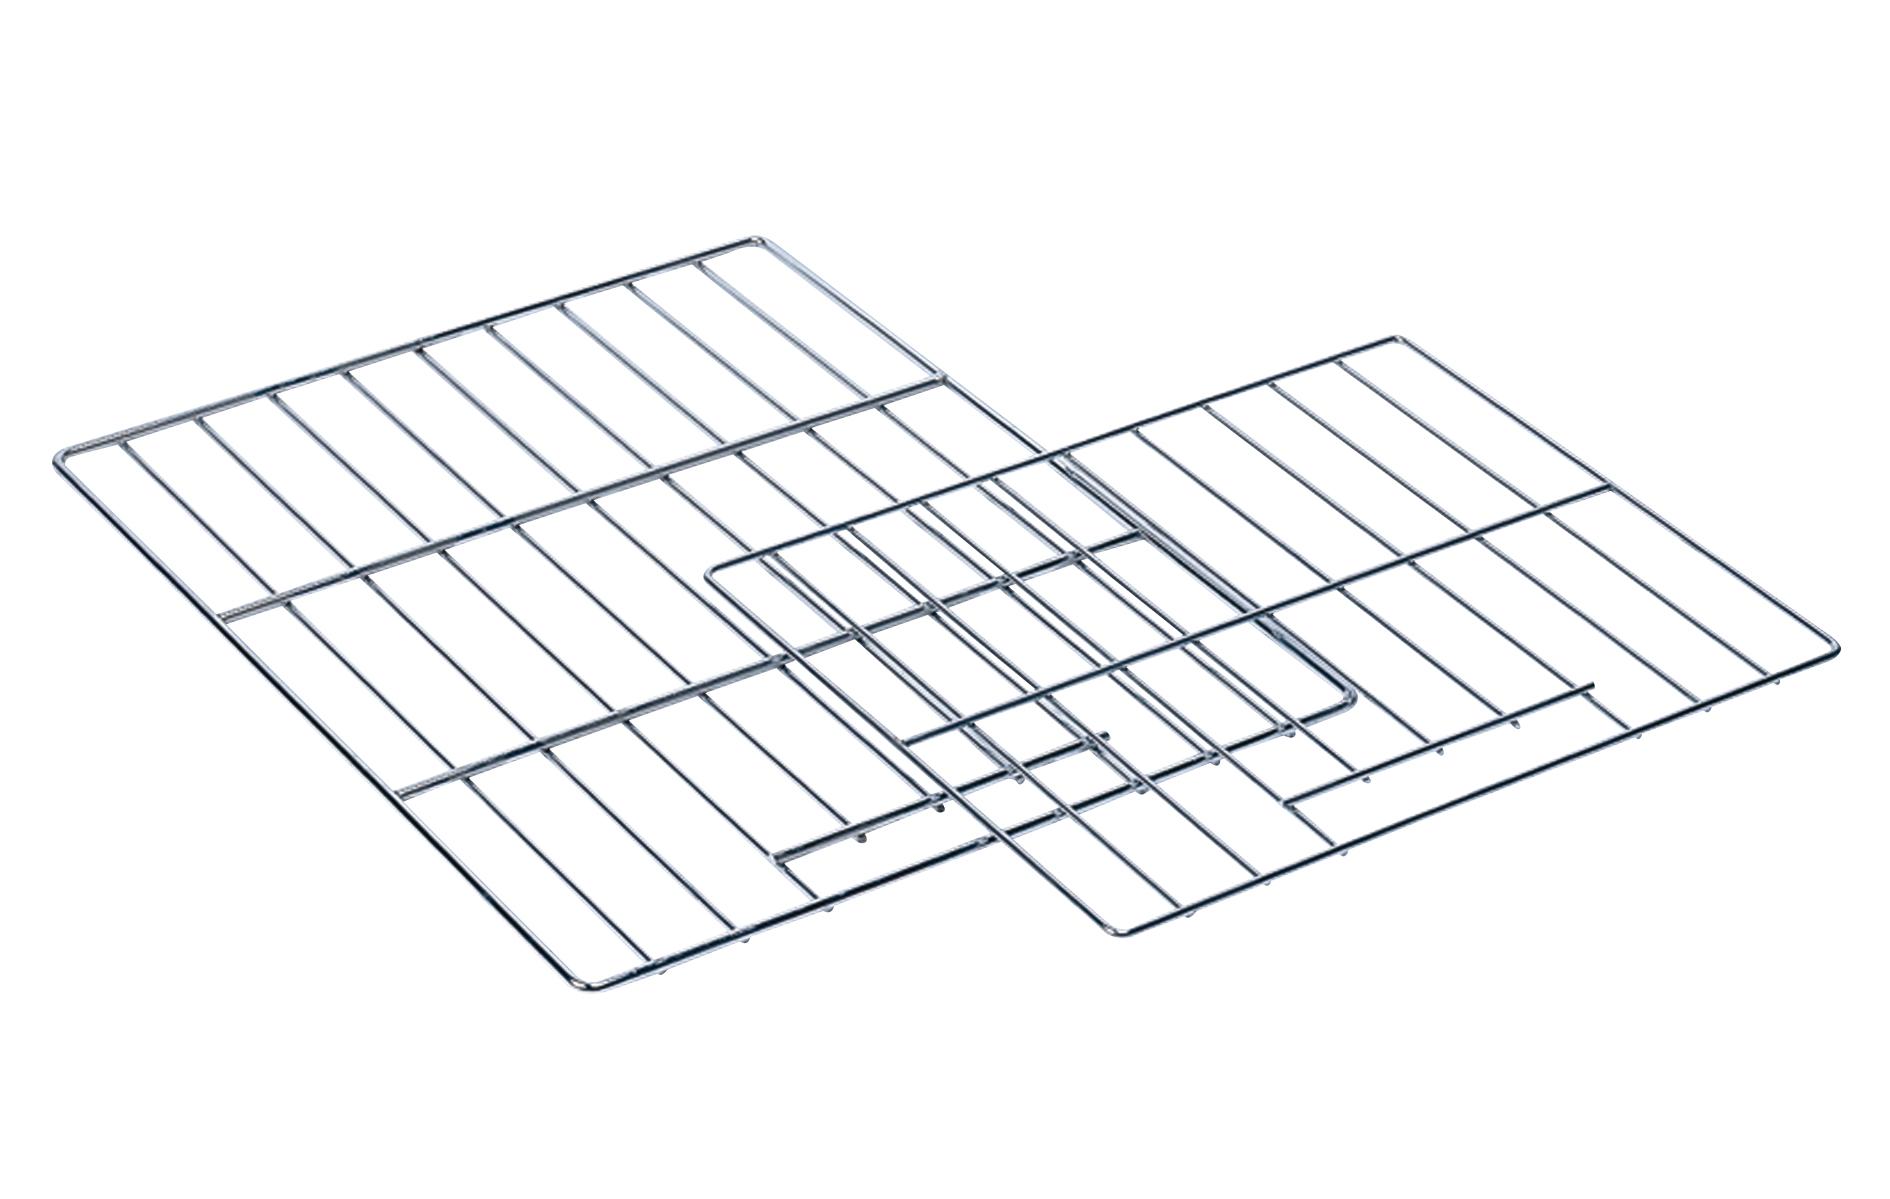 Eurast 31950000 Rejilla para horno gn 1/1 - 530x325 mm